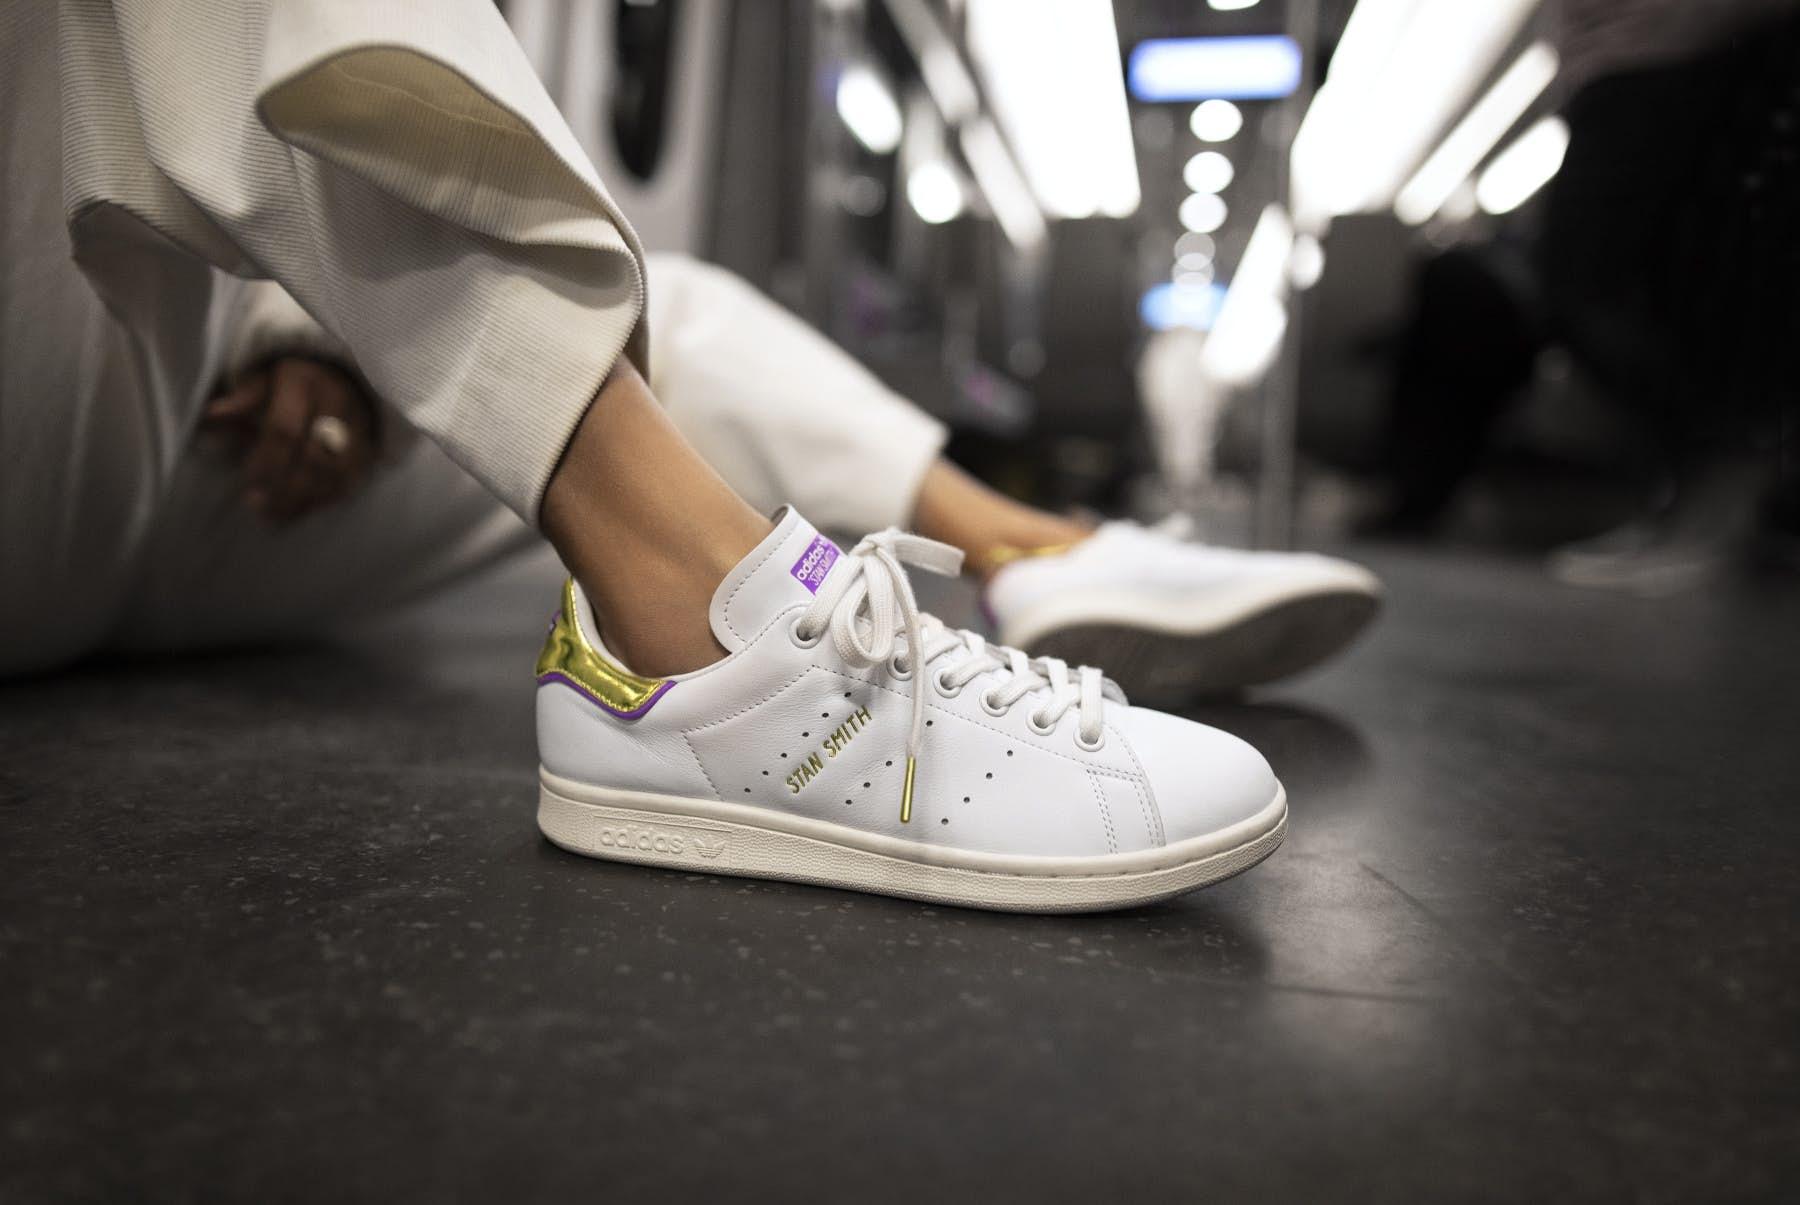 Adidas' latest trainers celebrate London's Tube lines